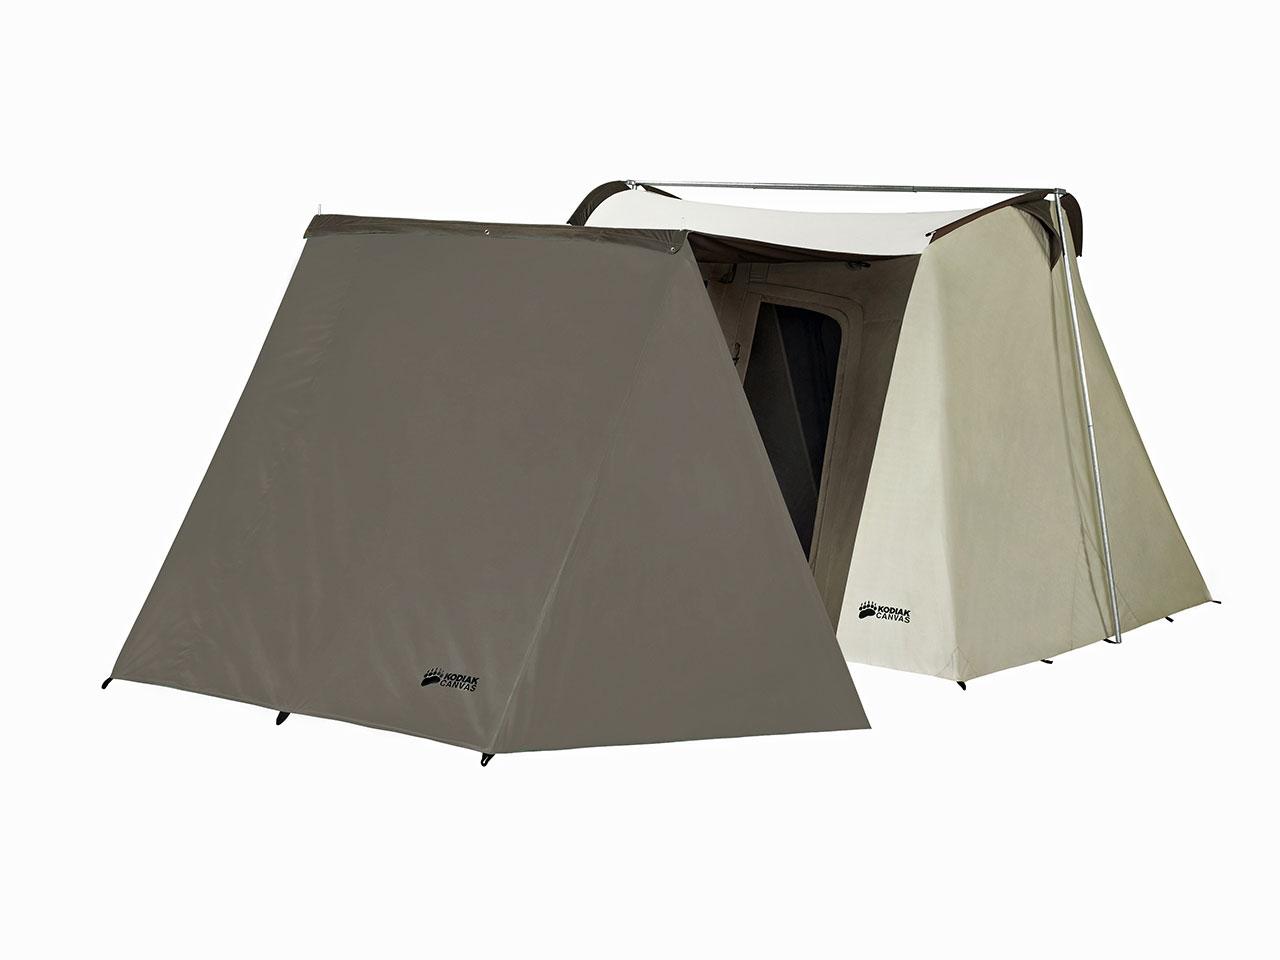 ... assets/images/vestibulenewstyle.jpg ...  sc 1 st  Competitive Edge Products Inc & Kodiak Vestibule Wing 0601 For 10-Ft Canvas Tents